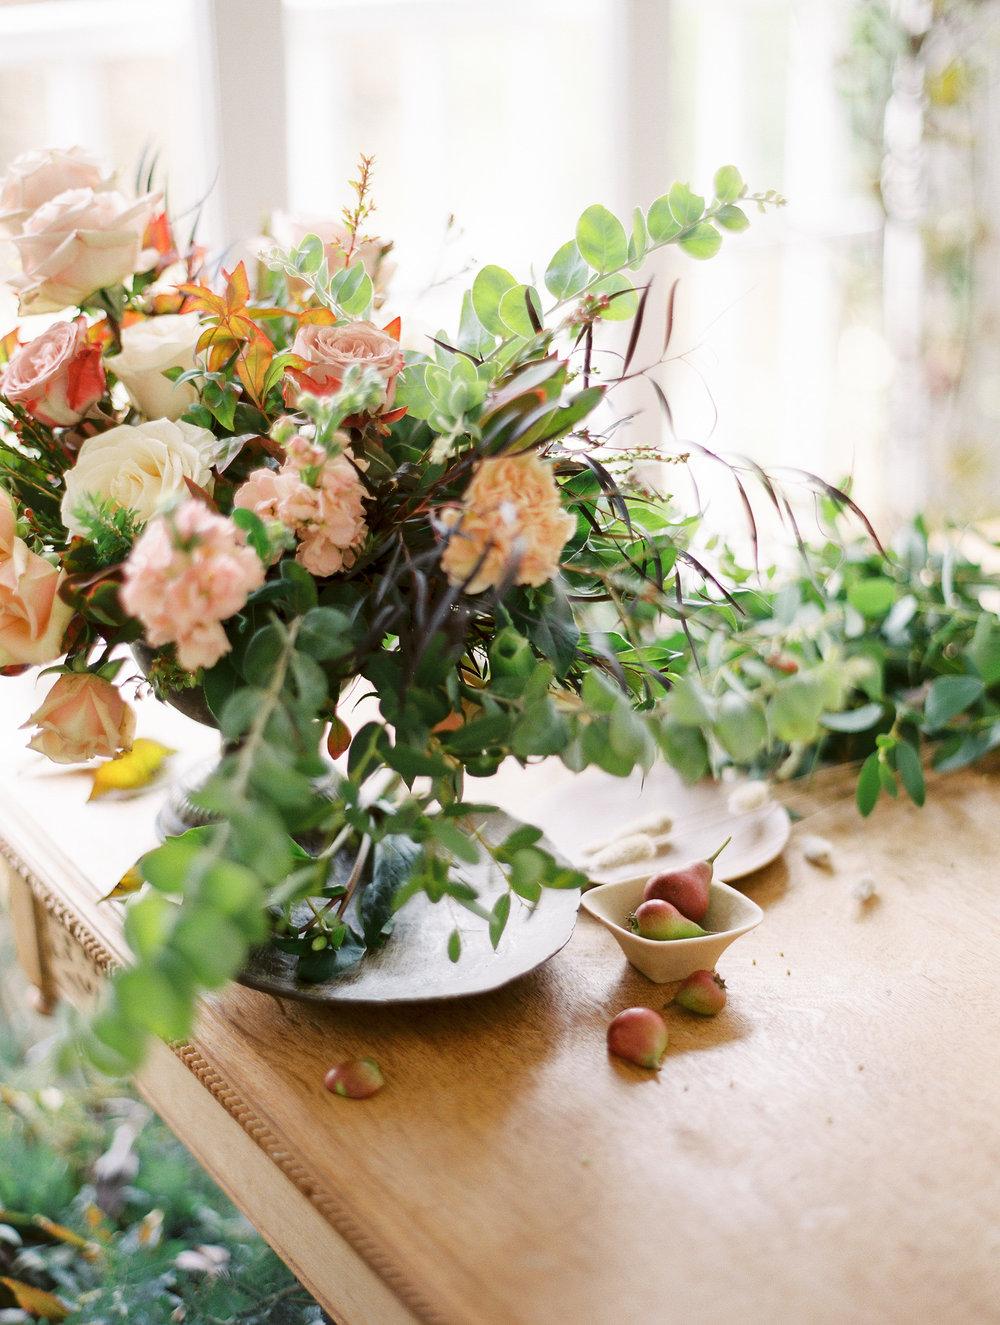 sandra-chau-stylist-floral-florist-branding-lifestyle-shoot-we-are-origami168.jpg